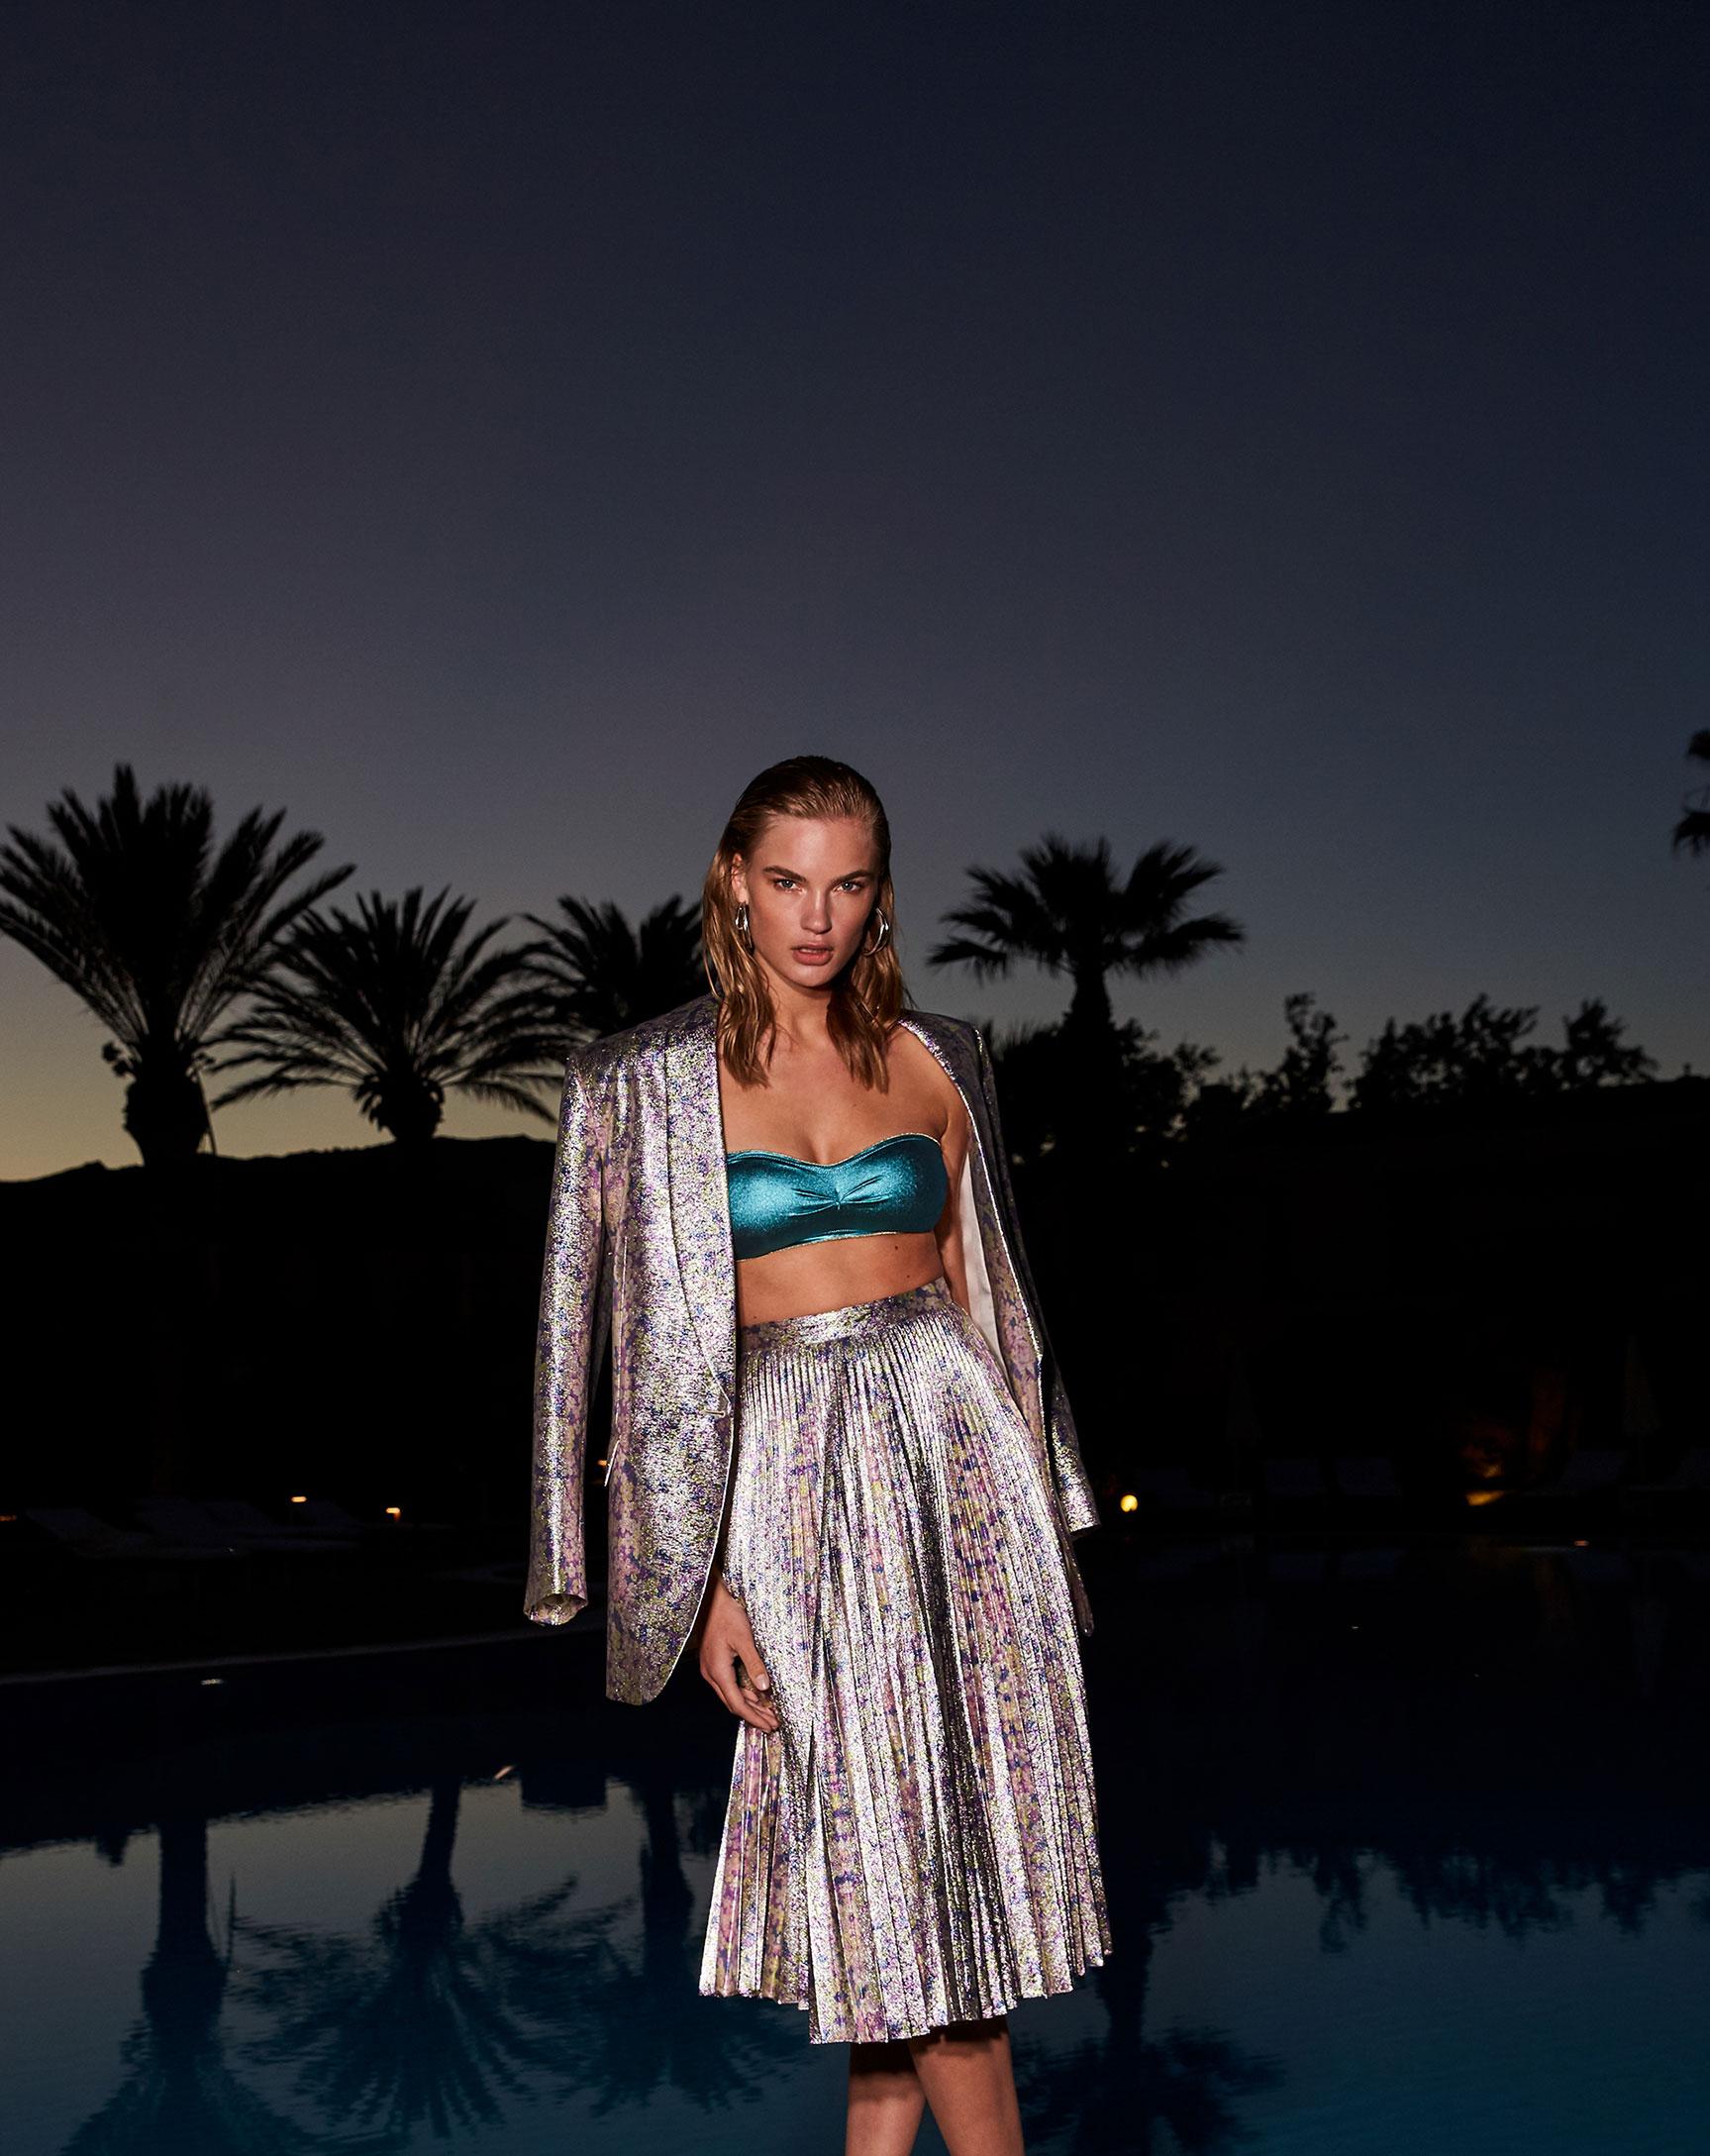 модная одежда Ermanno Scervino / Isabel Scholten by Rocio Ramos / F Italia Magazine july 2019